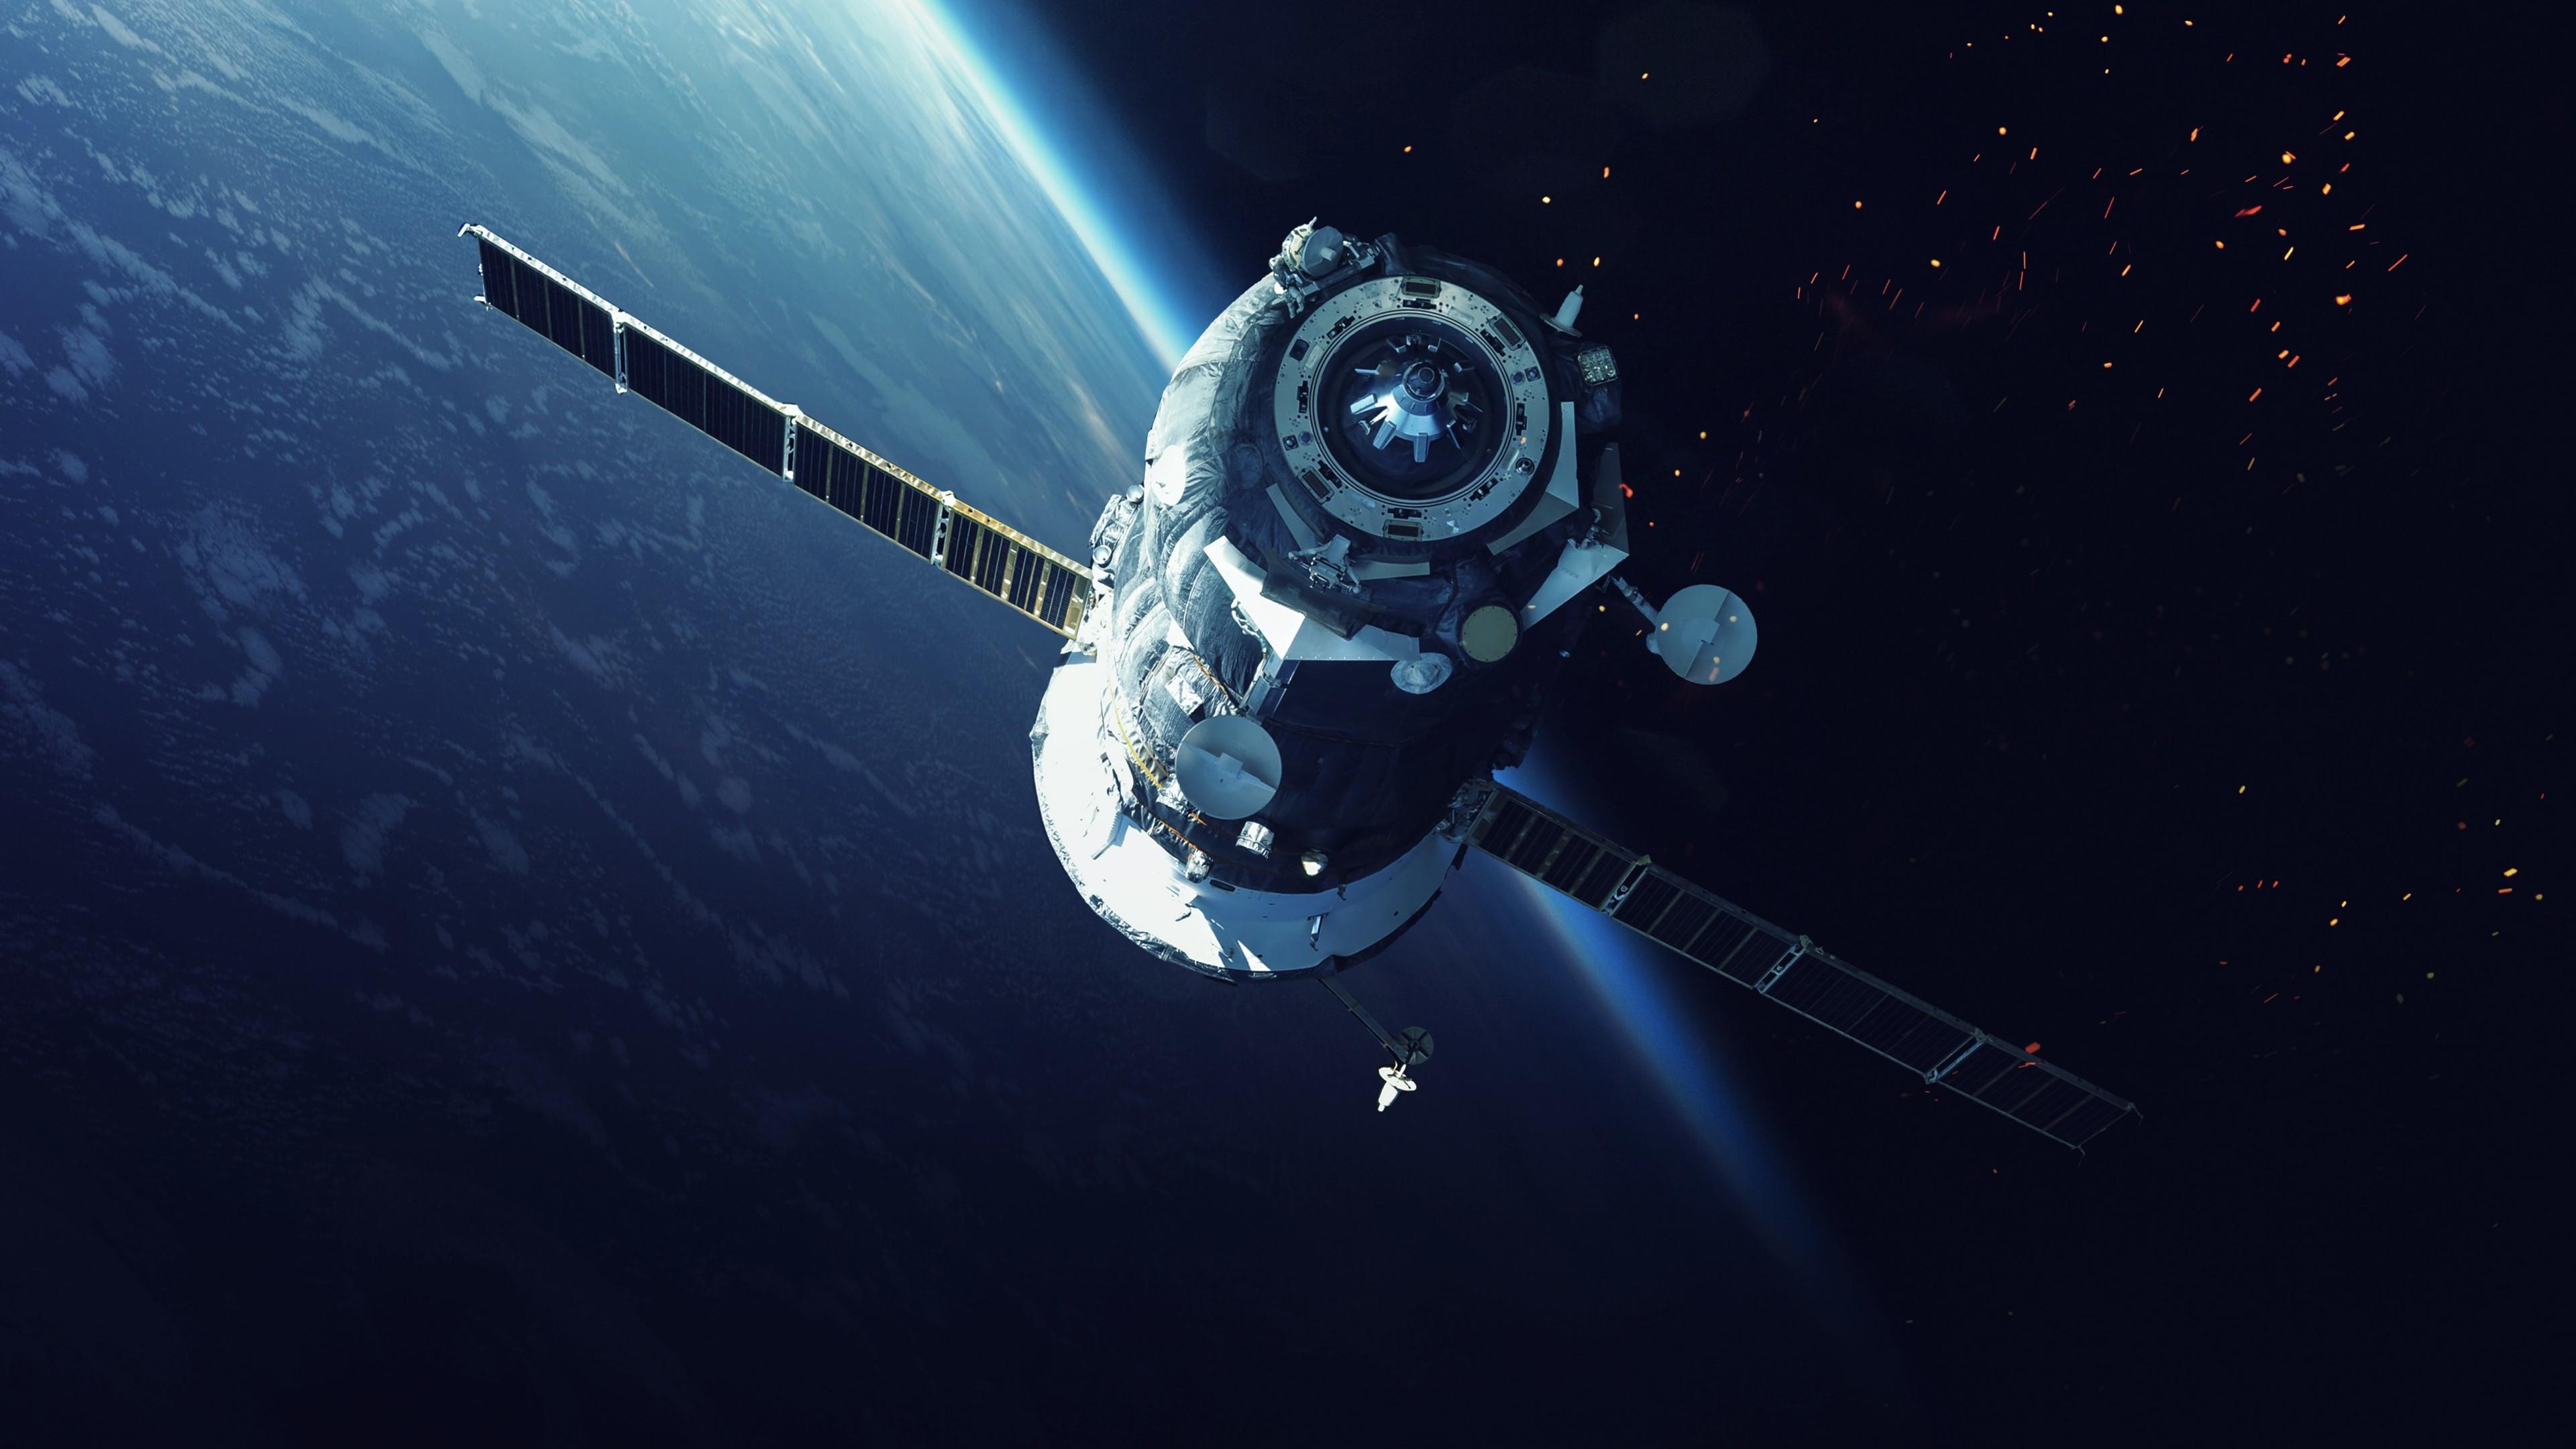 Tags: Space Satellite, NASA, 5K